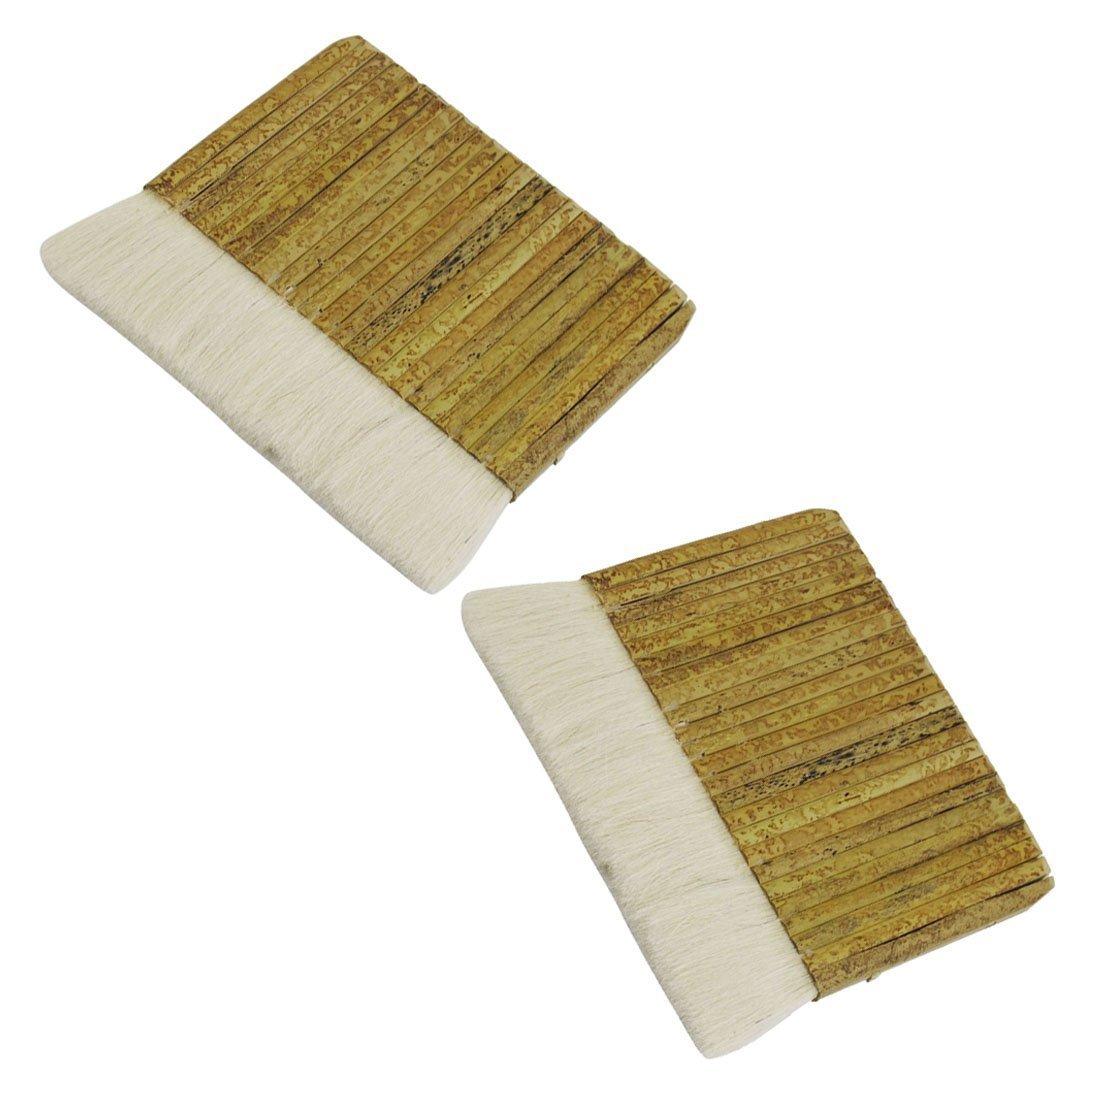 R 6  ancho Pincel de pintura de lana de imitacion blanco de mango de bambu caqui rectangular TOOGOO Pincel de pintura